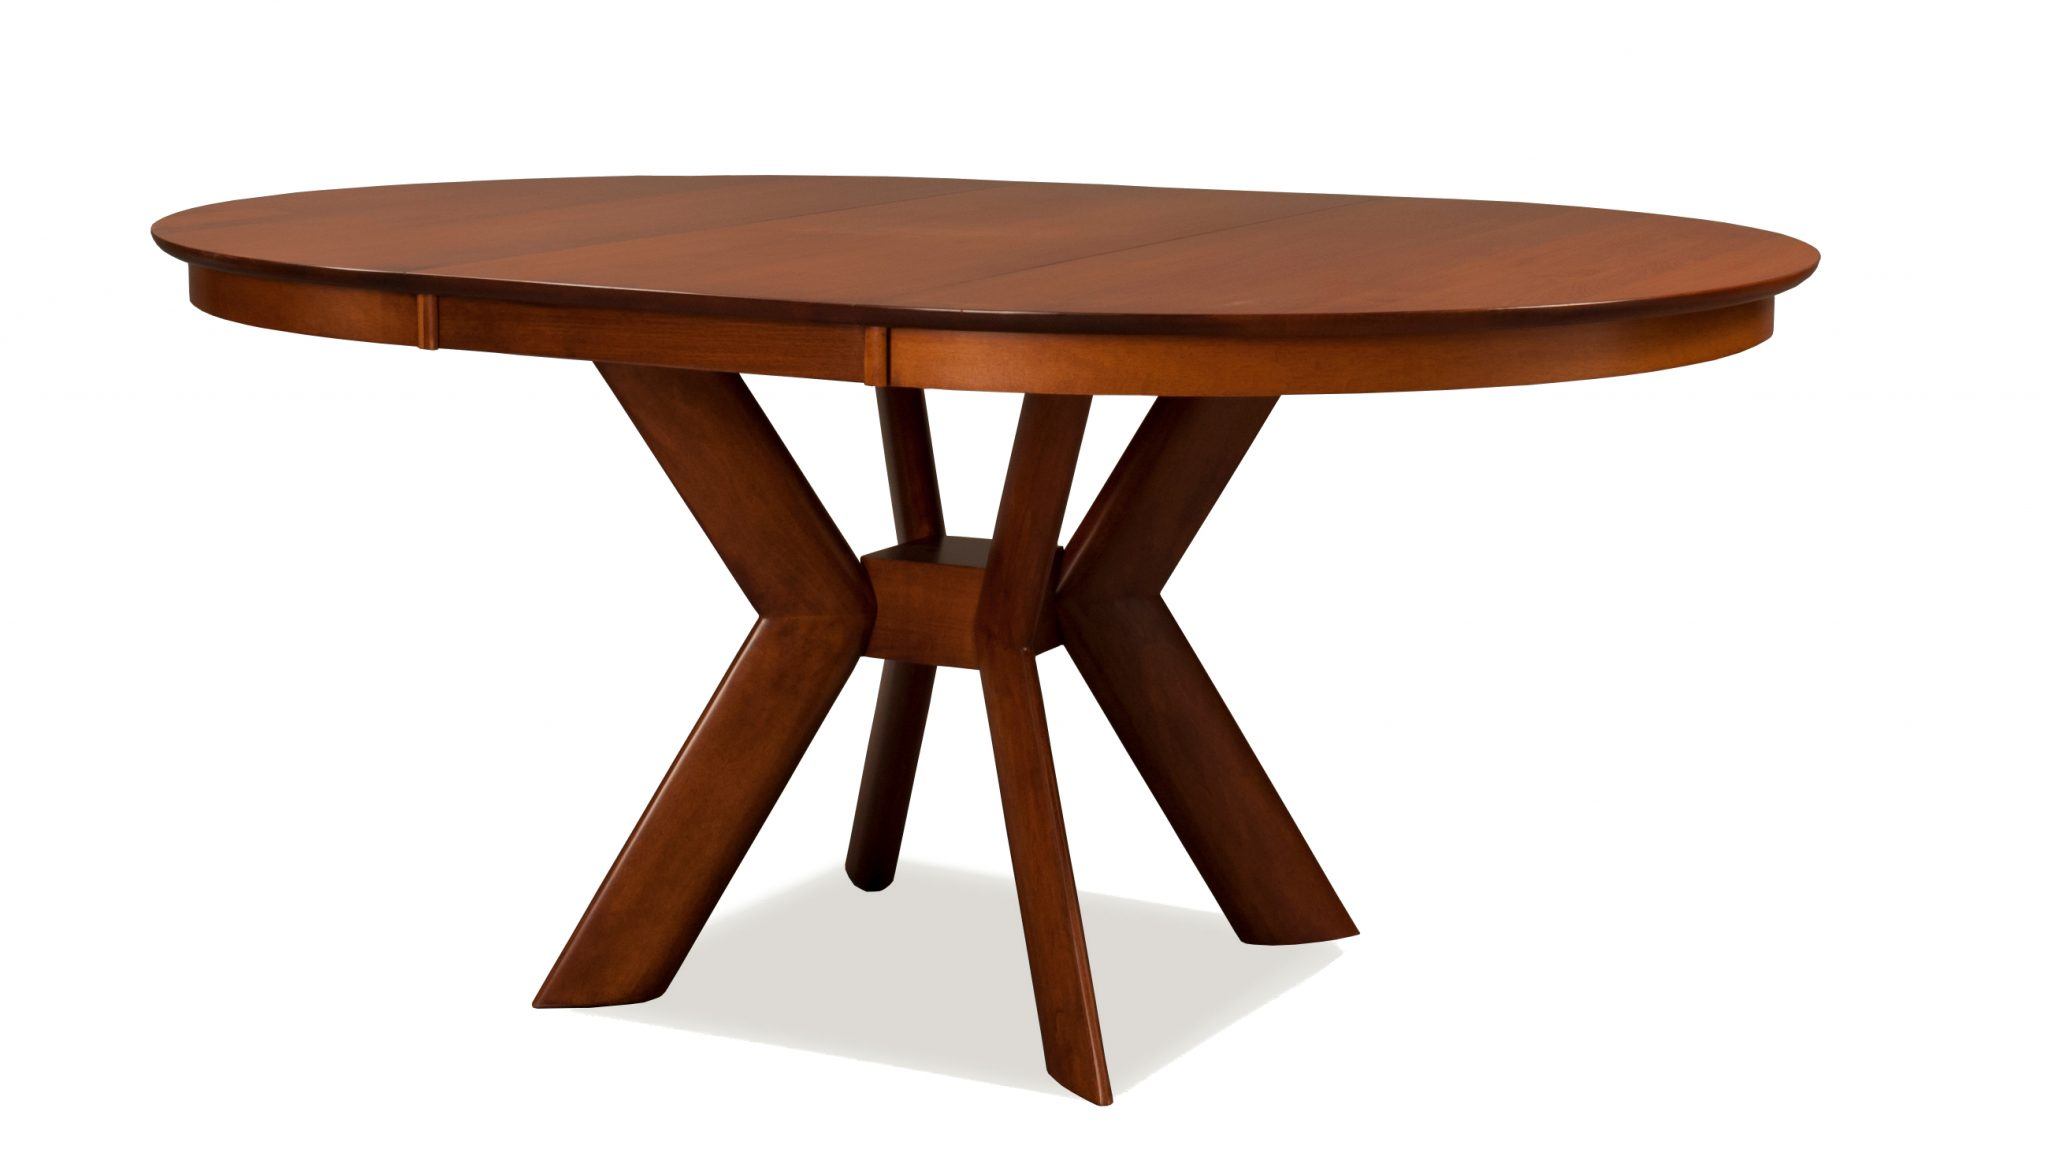 K-Base Dining Table – Saloom Furniture Company